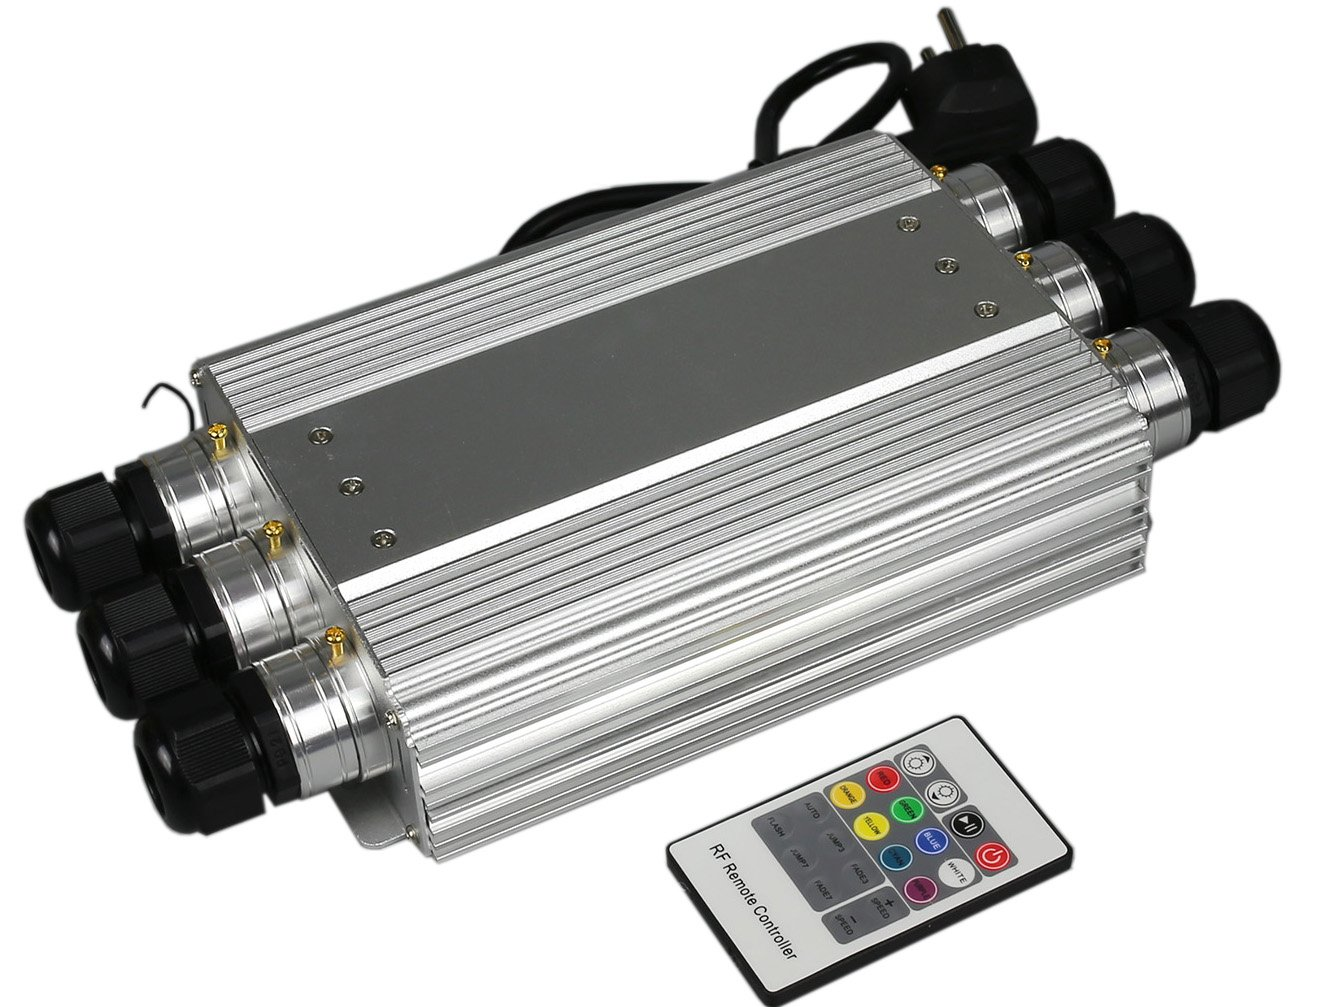 50w Fiber Optic Lamp 6ports Led Light Engine Optical Fiber Light Box Wireless Rf Remote